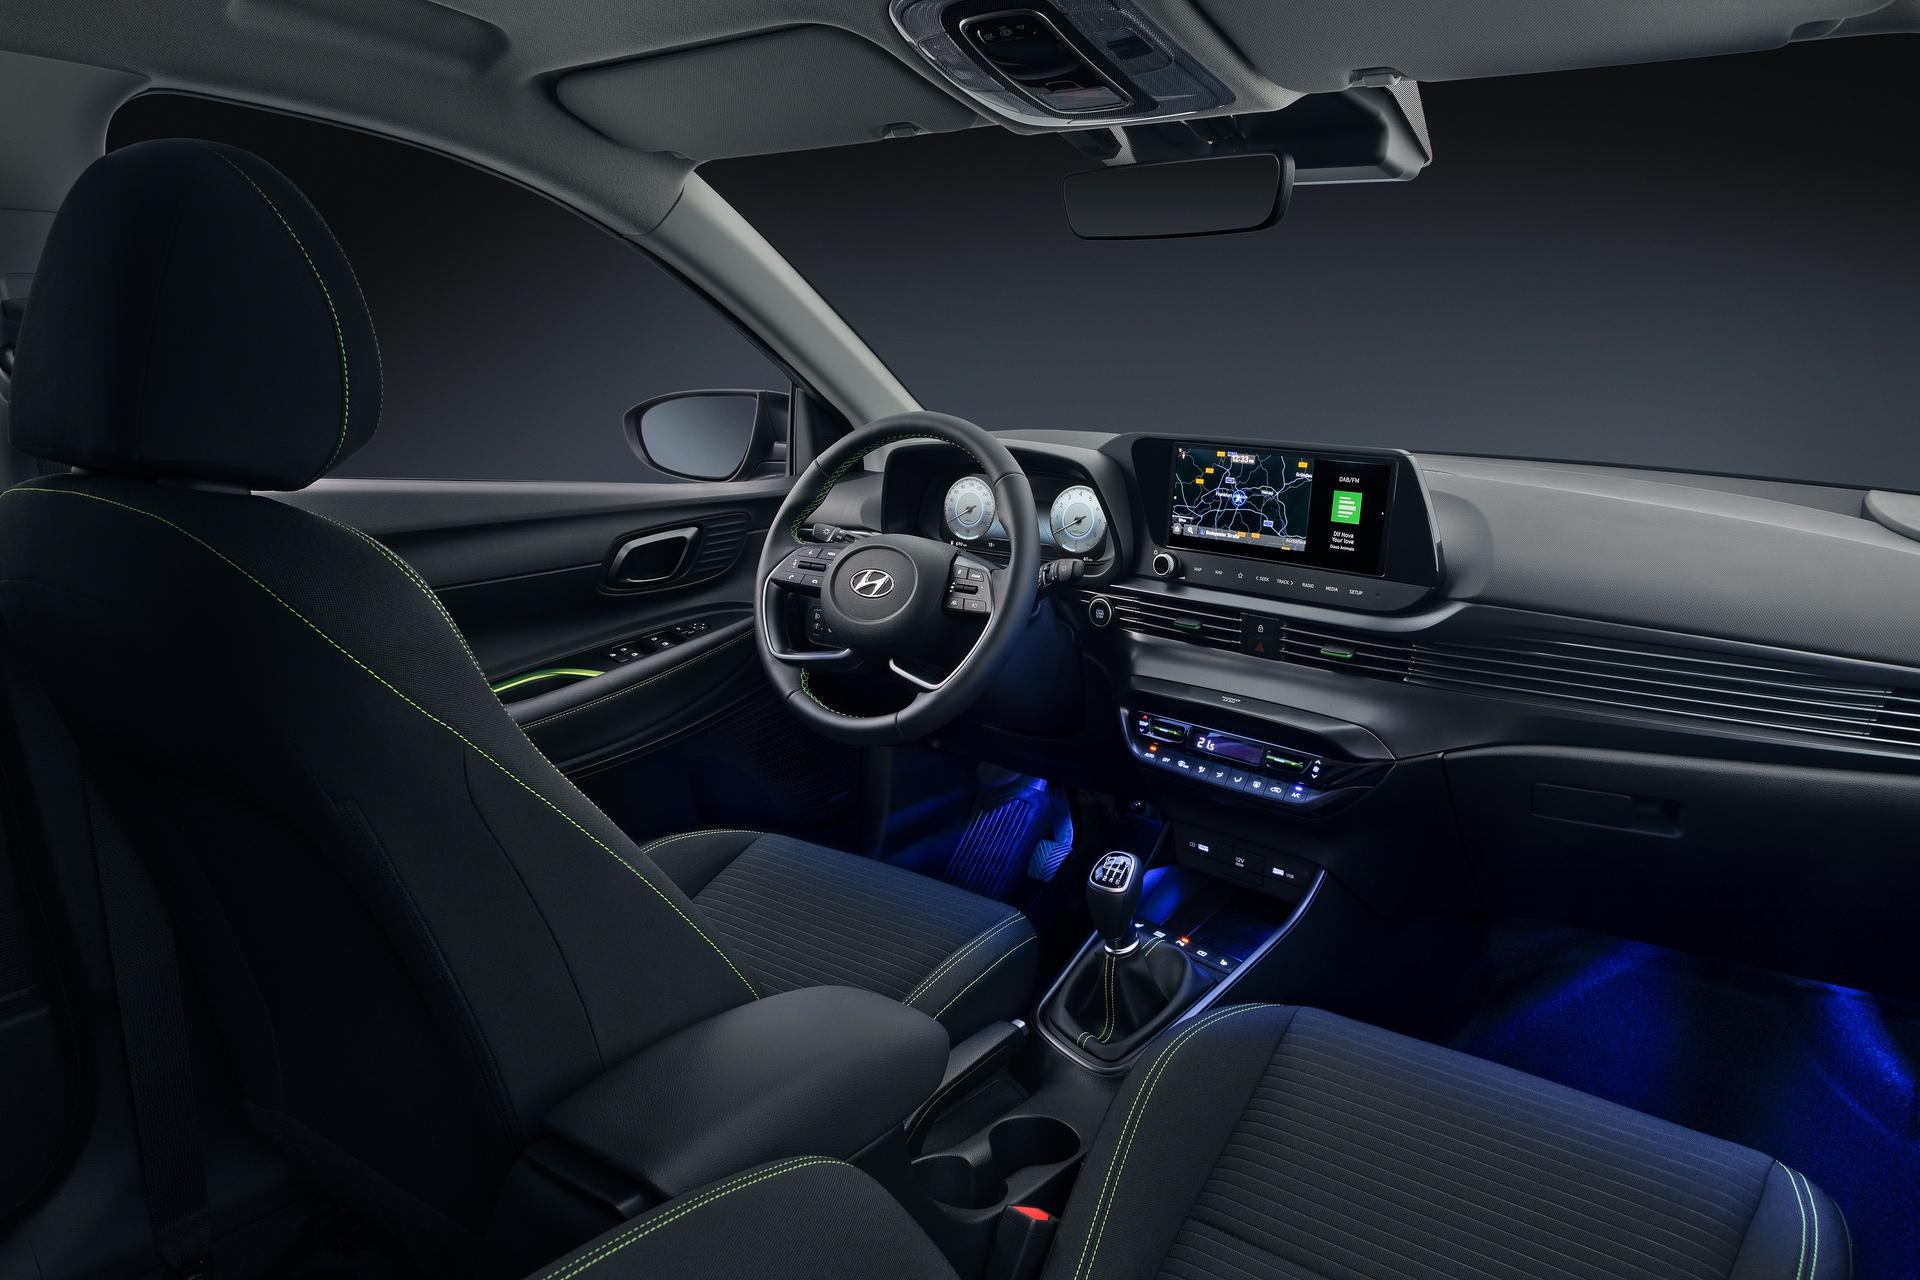 Hyundai_i20_interior_0005